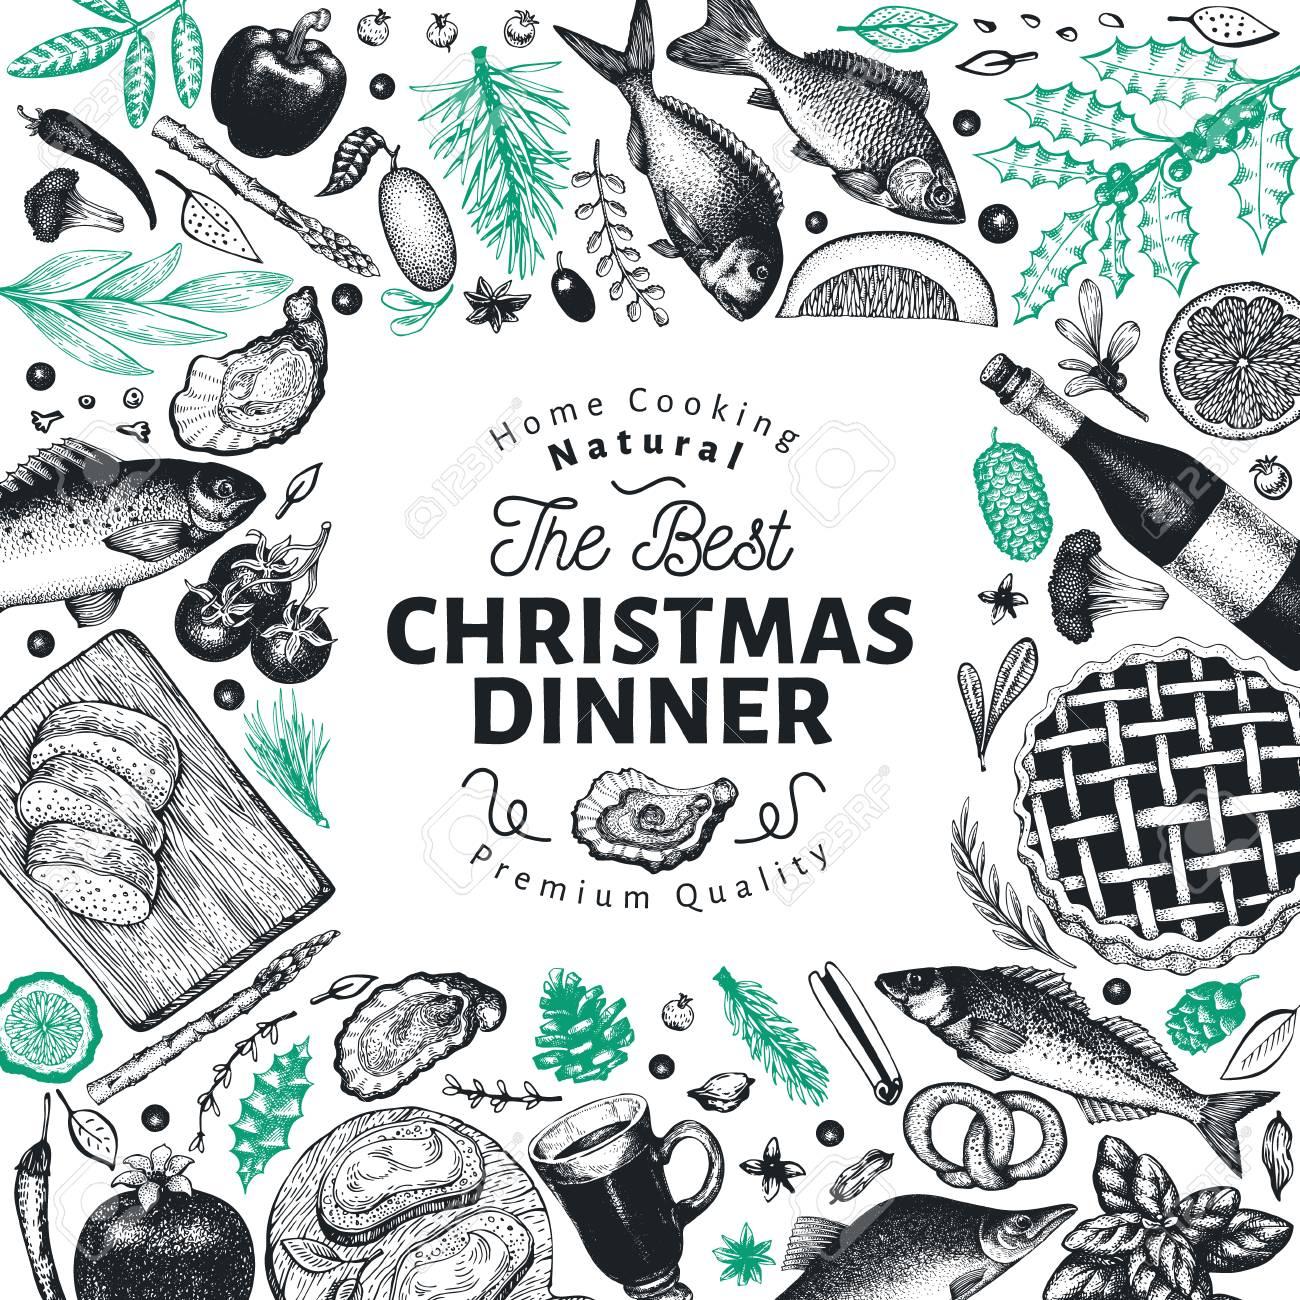 Happy Christmas Dinner Design Template Vector Hand Drawn Illustrations